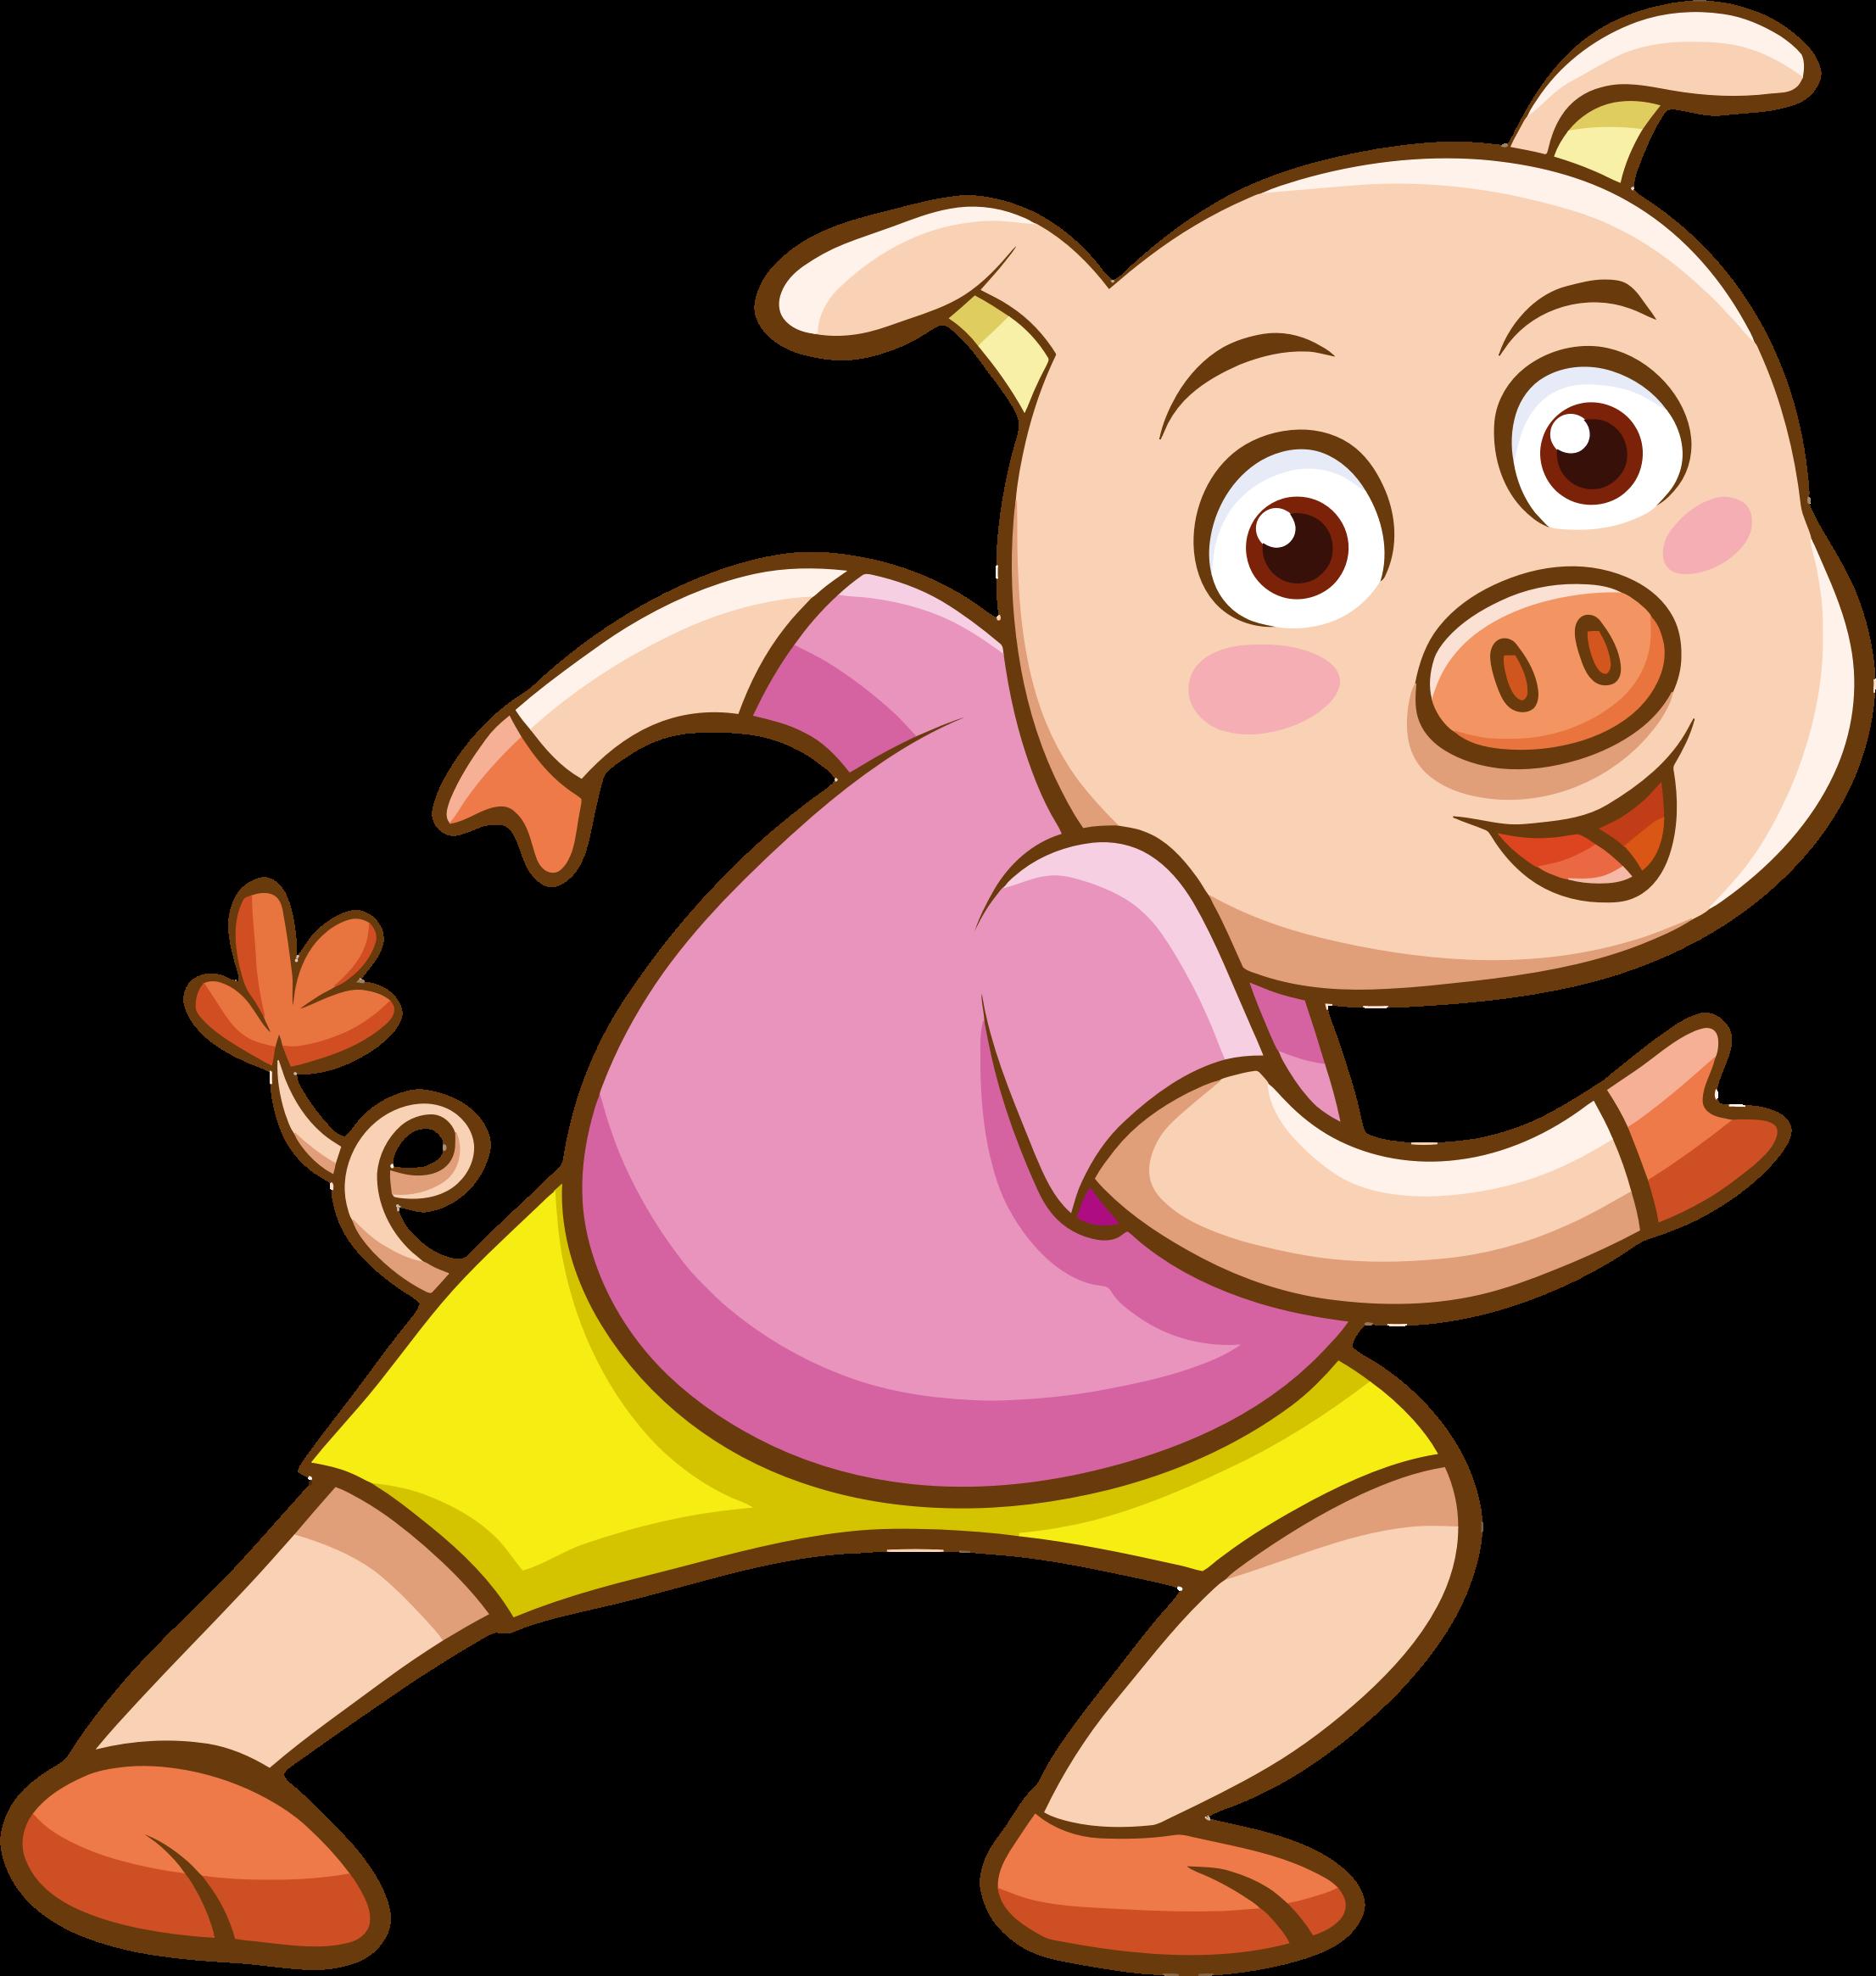 Cartoon big image png. Clipart pig character